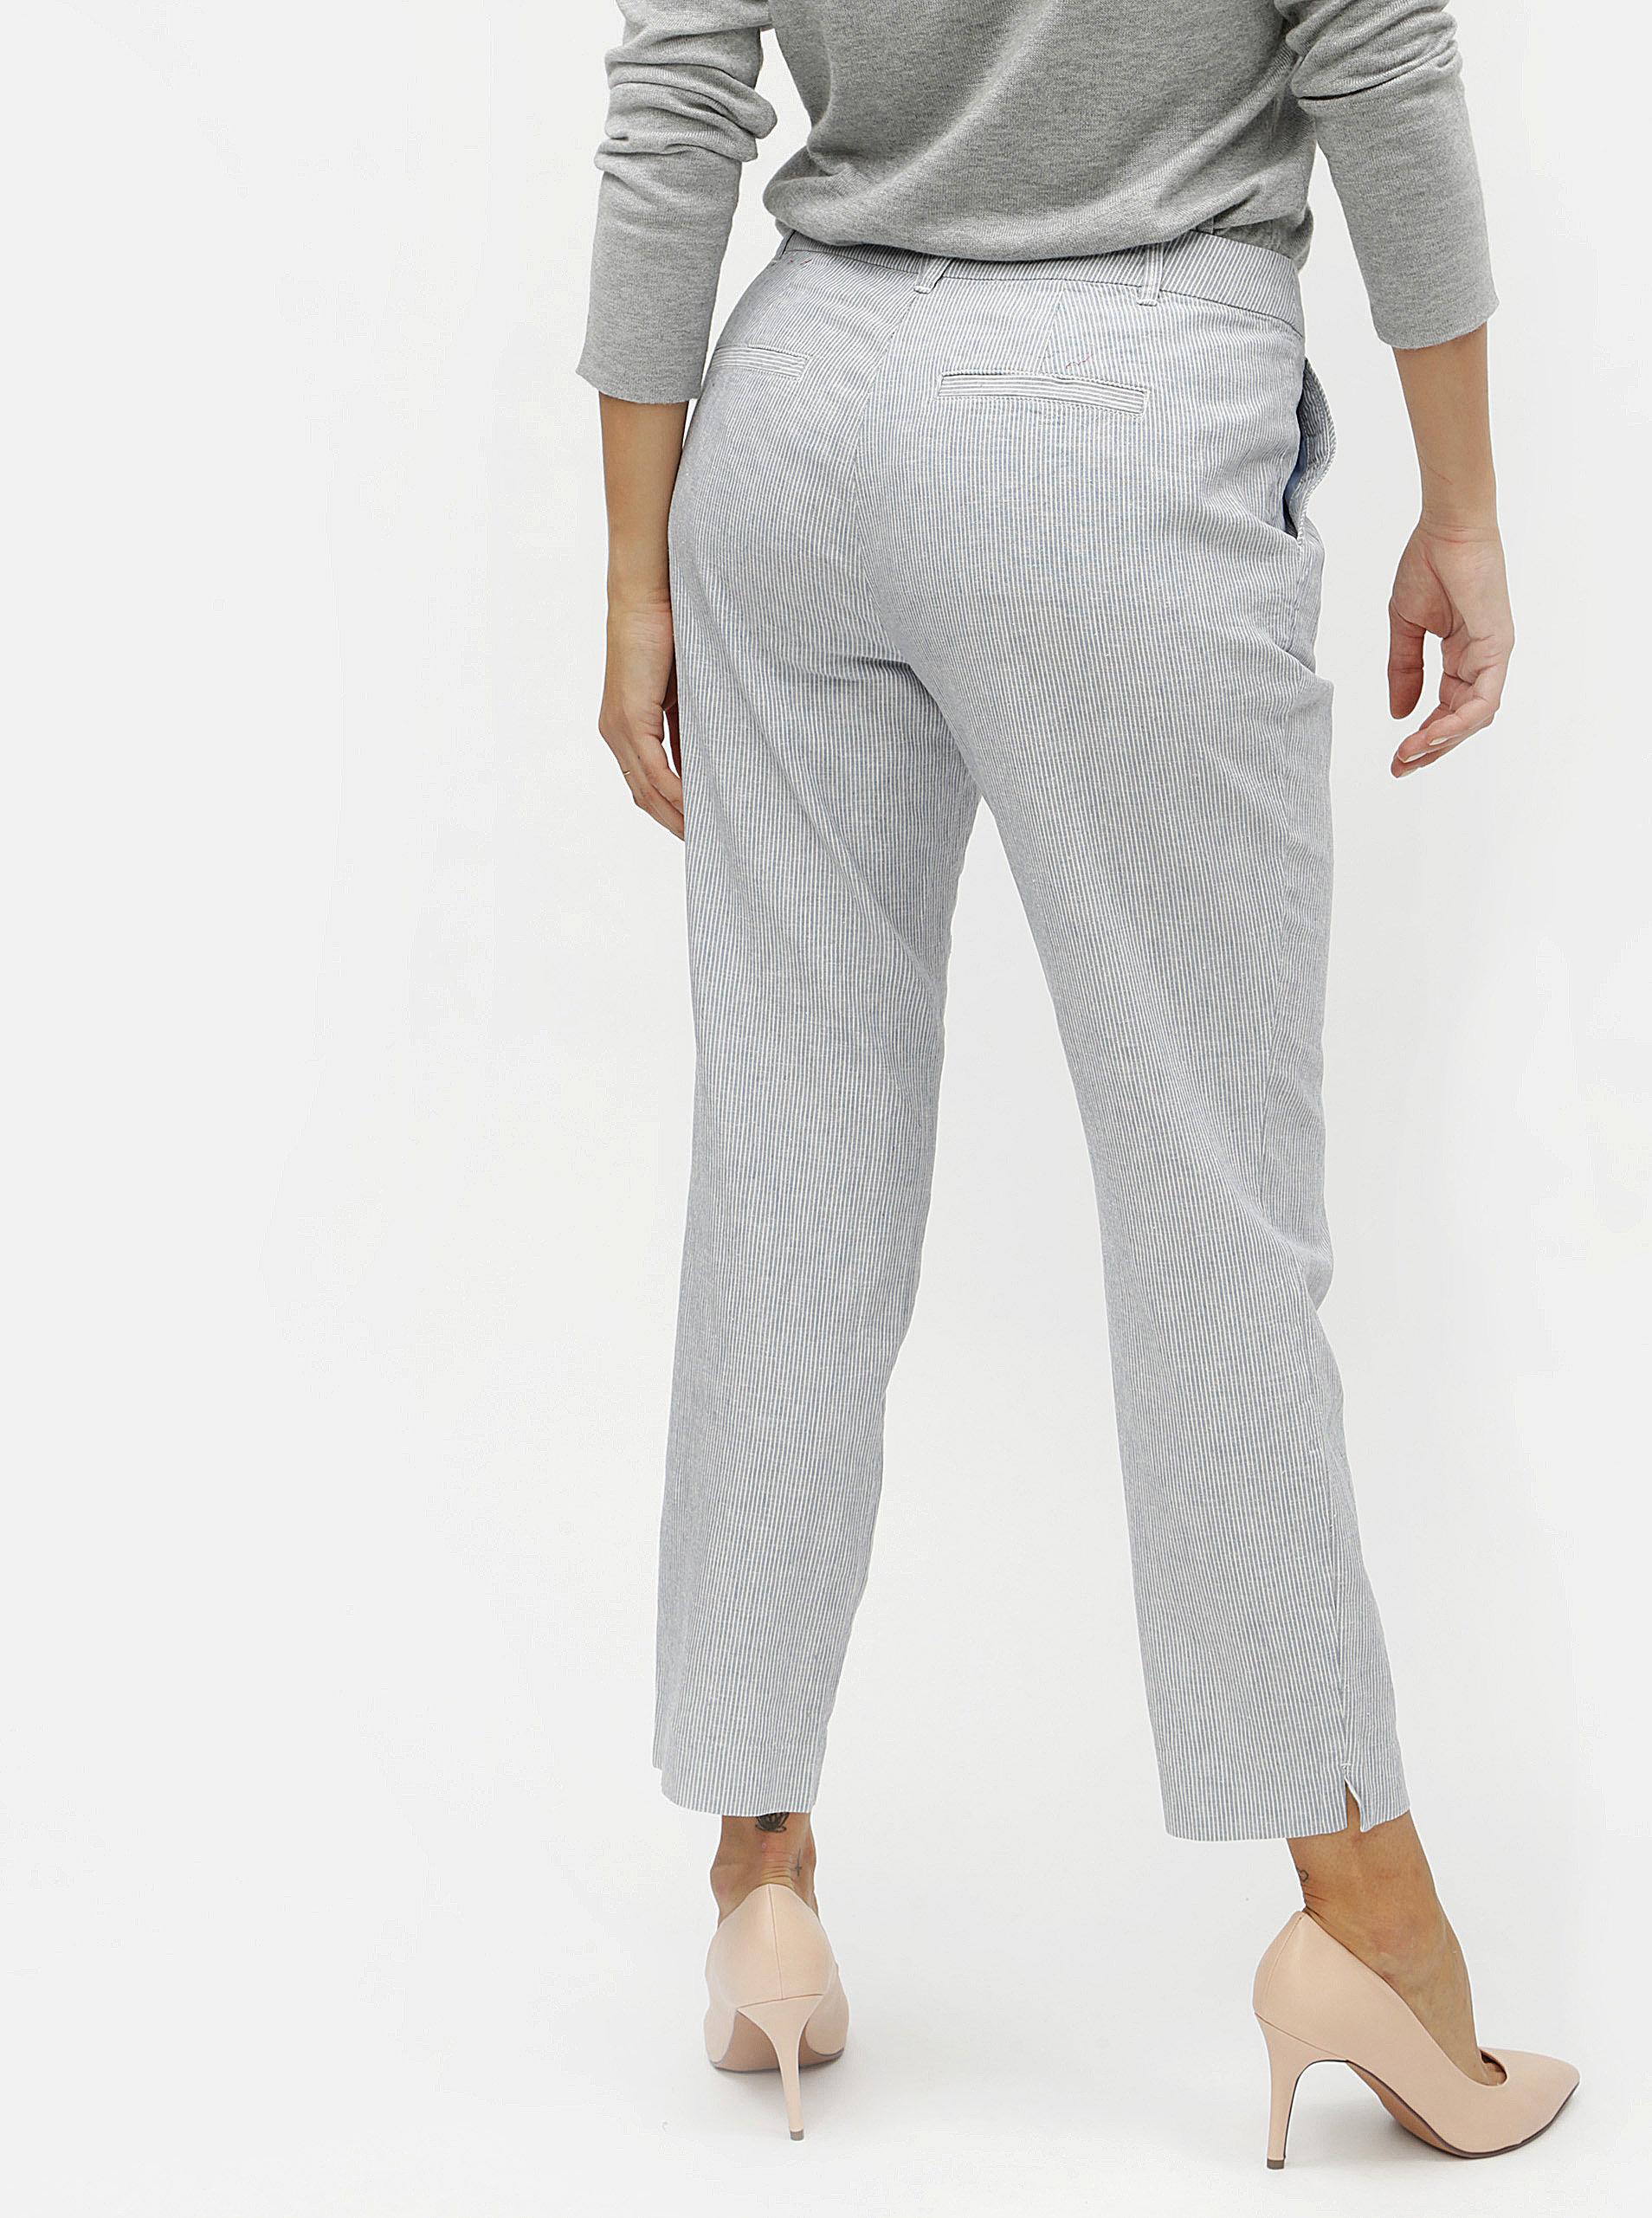 ca071840c Modré dámske ľanové slim fit chino nohavice s.Oliver | ZOOT.sk